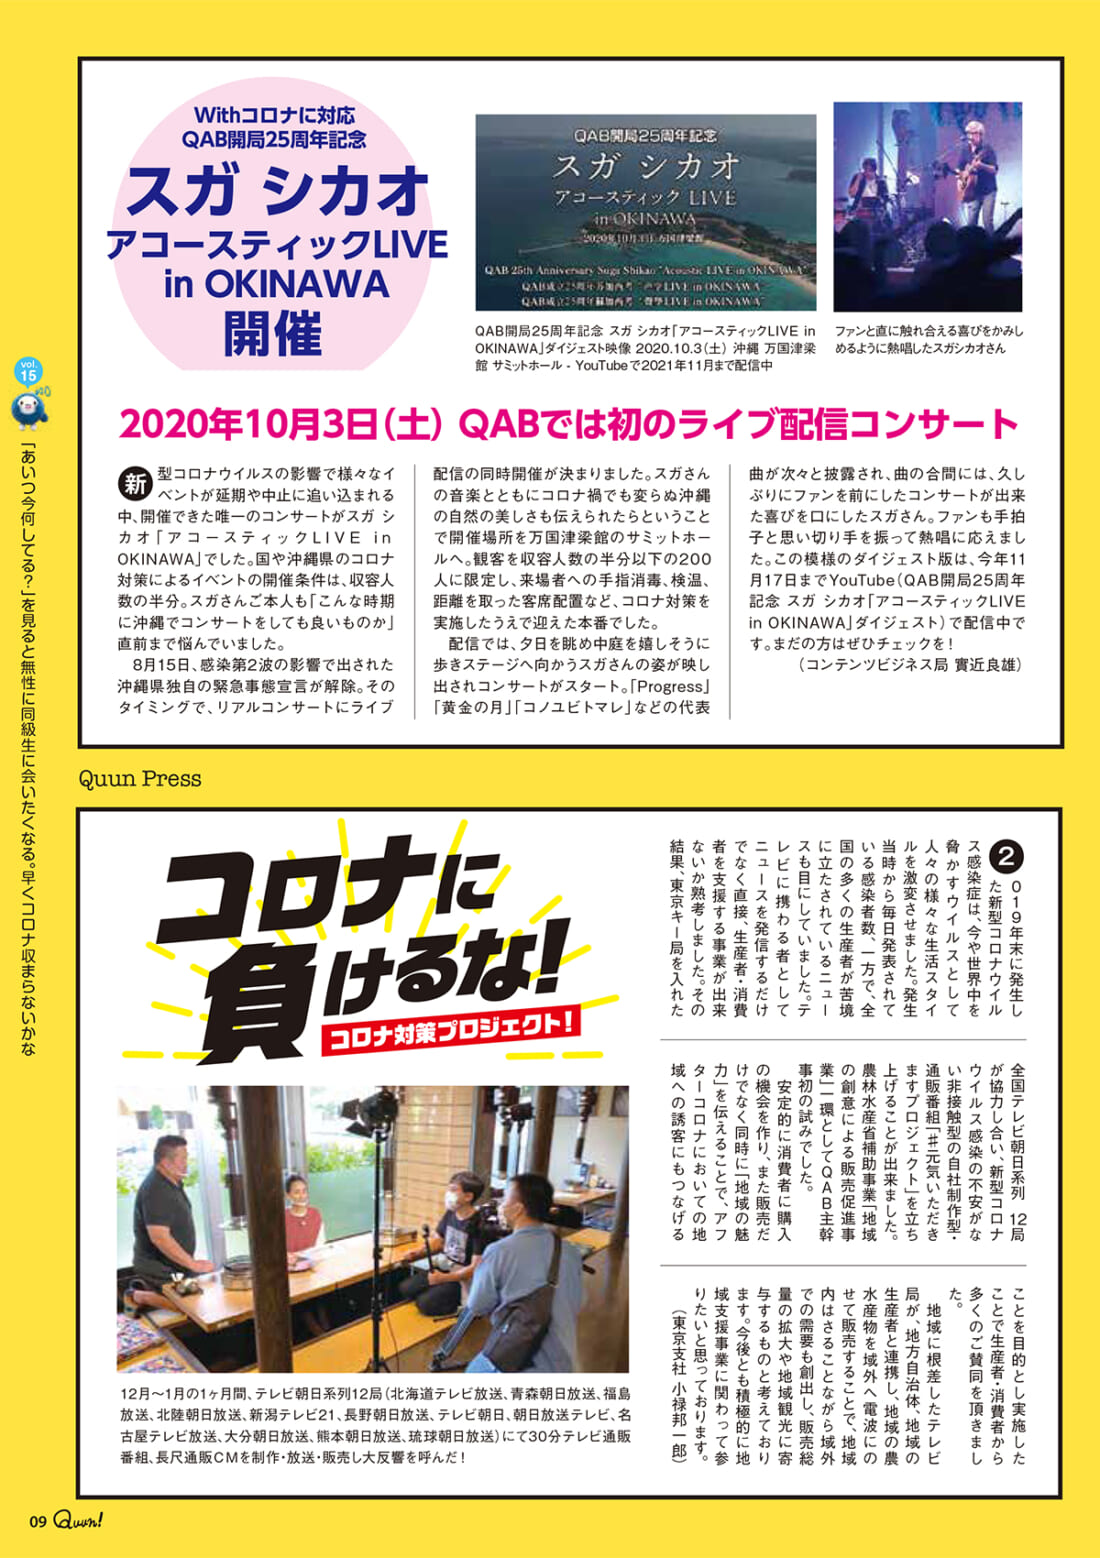 https://www.qab.co.jp/qgoro/wp-content/uploads/quun_1511-1100x1558.jpg